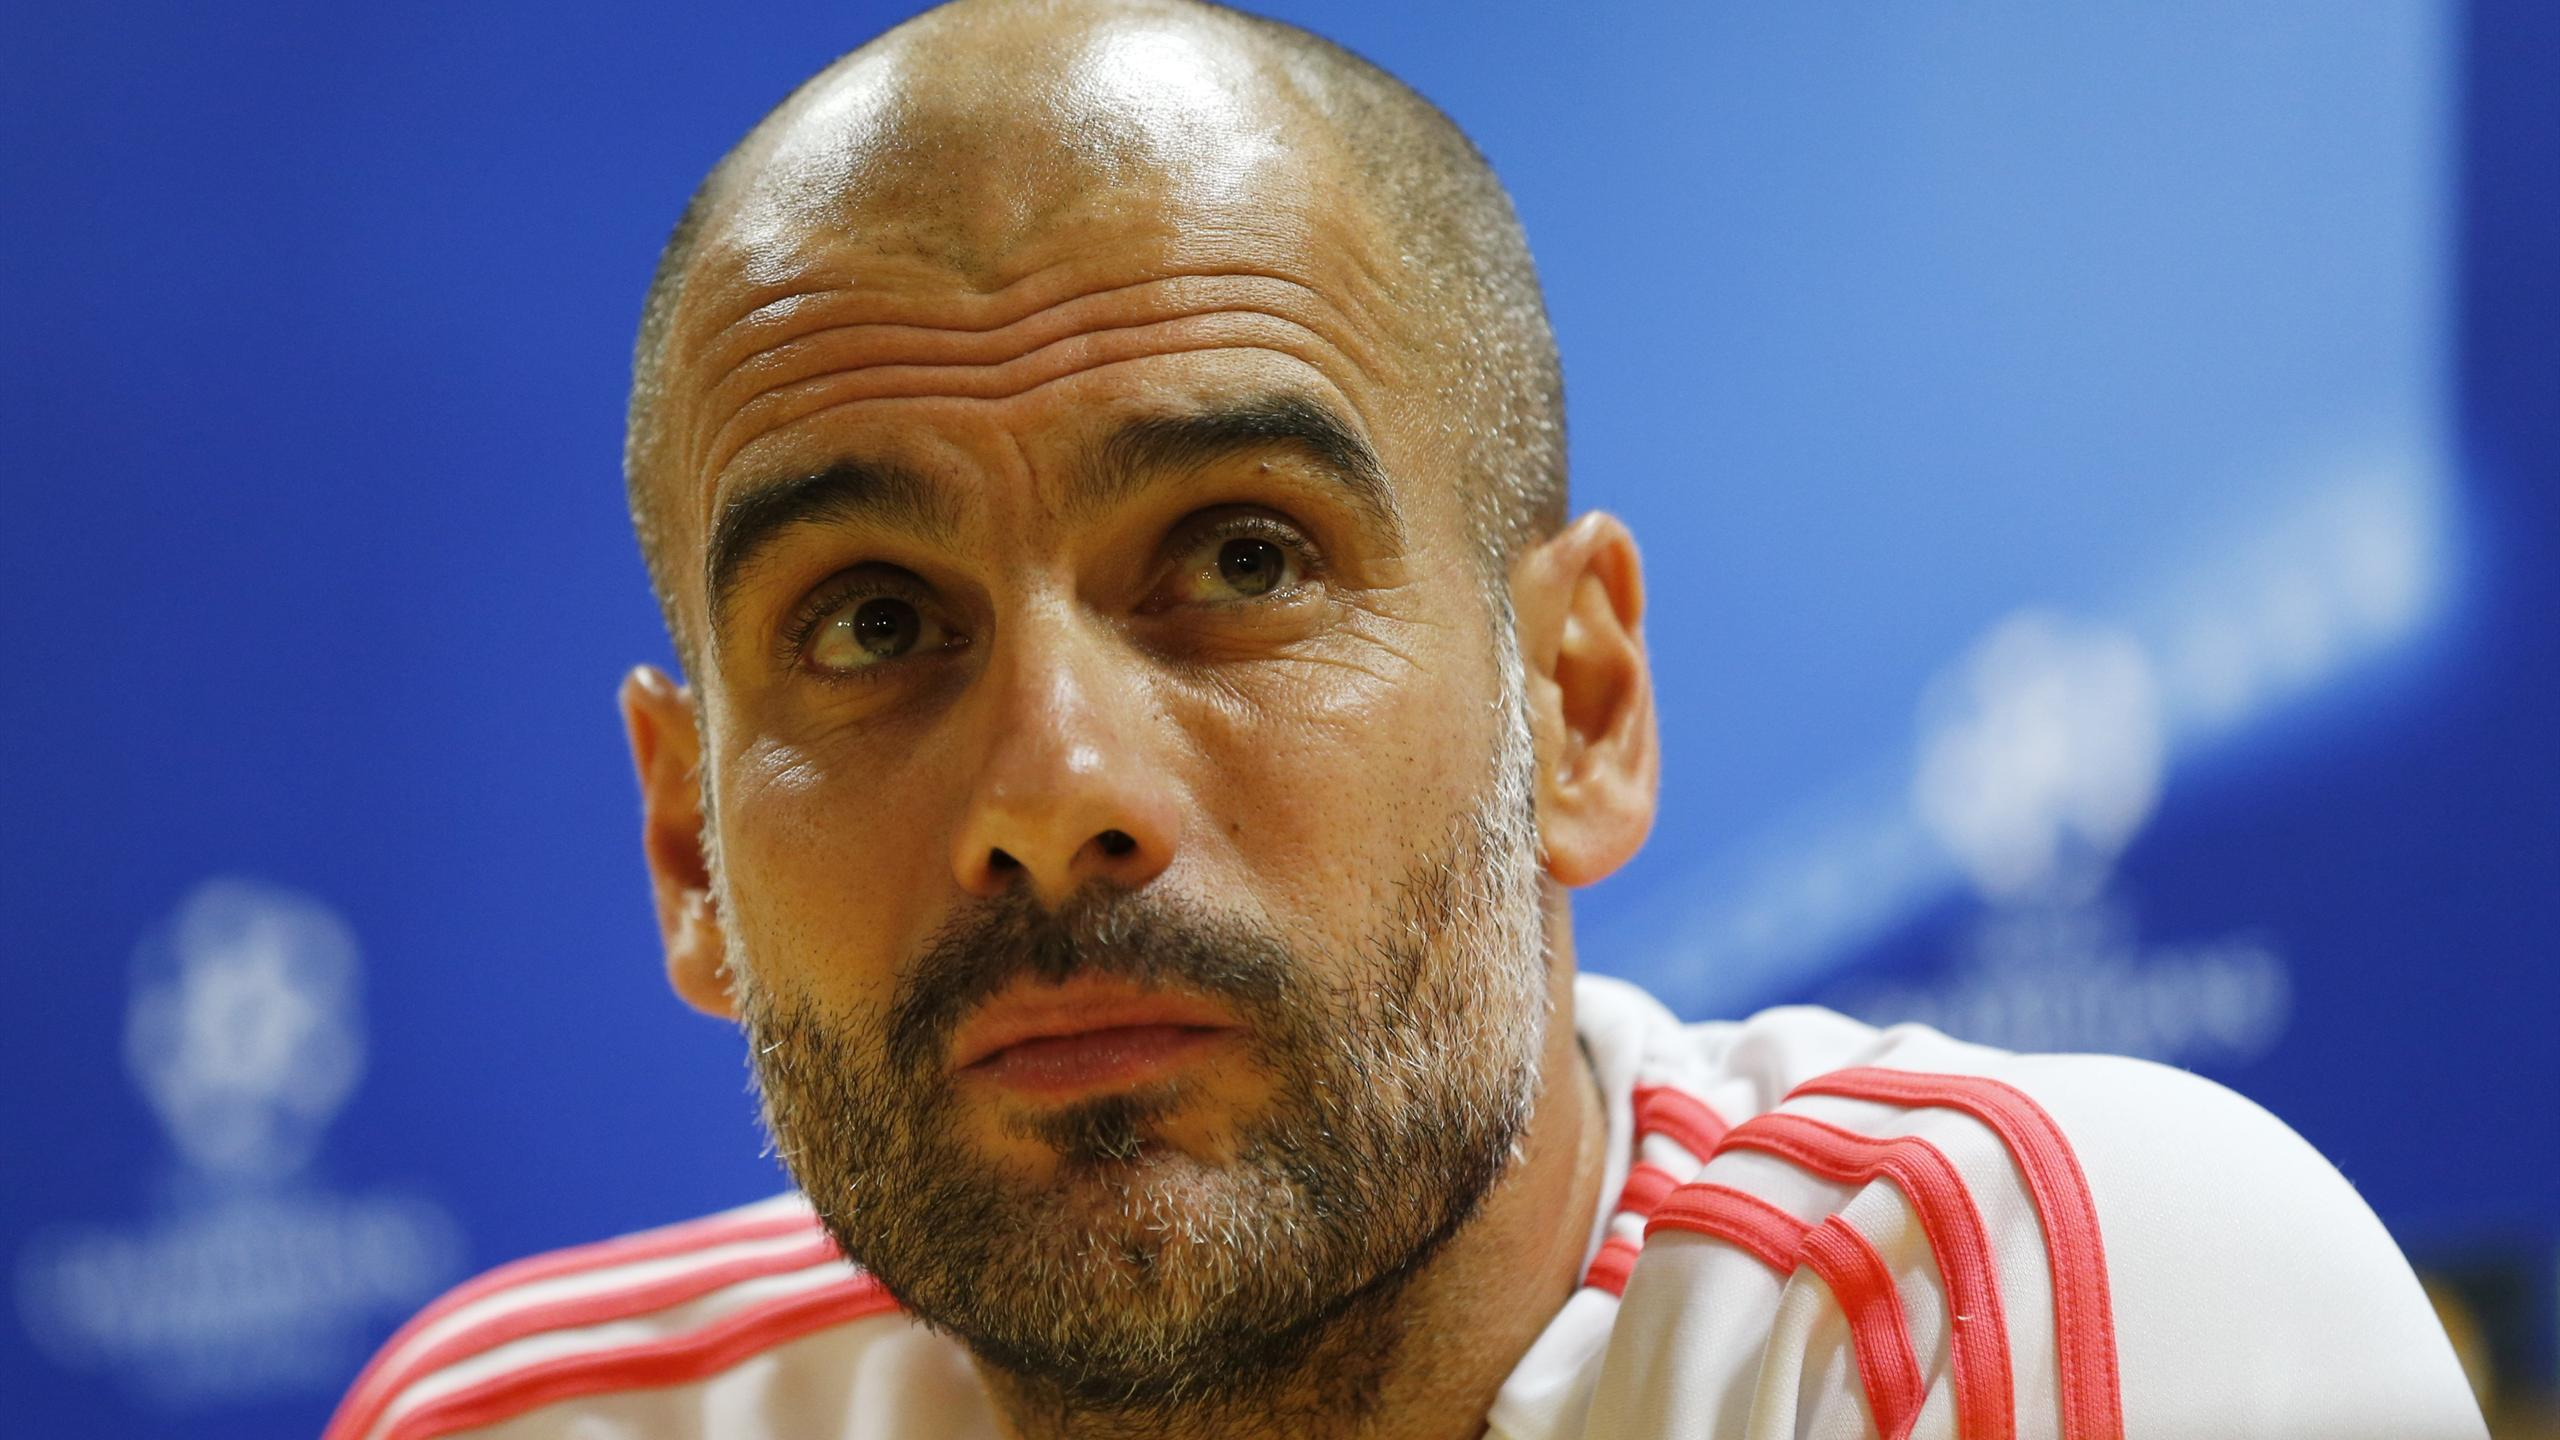 Bayern Munich coach Josep Guardiola during the press conference